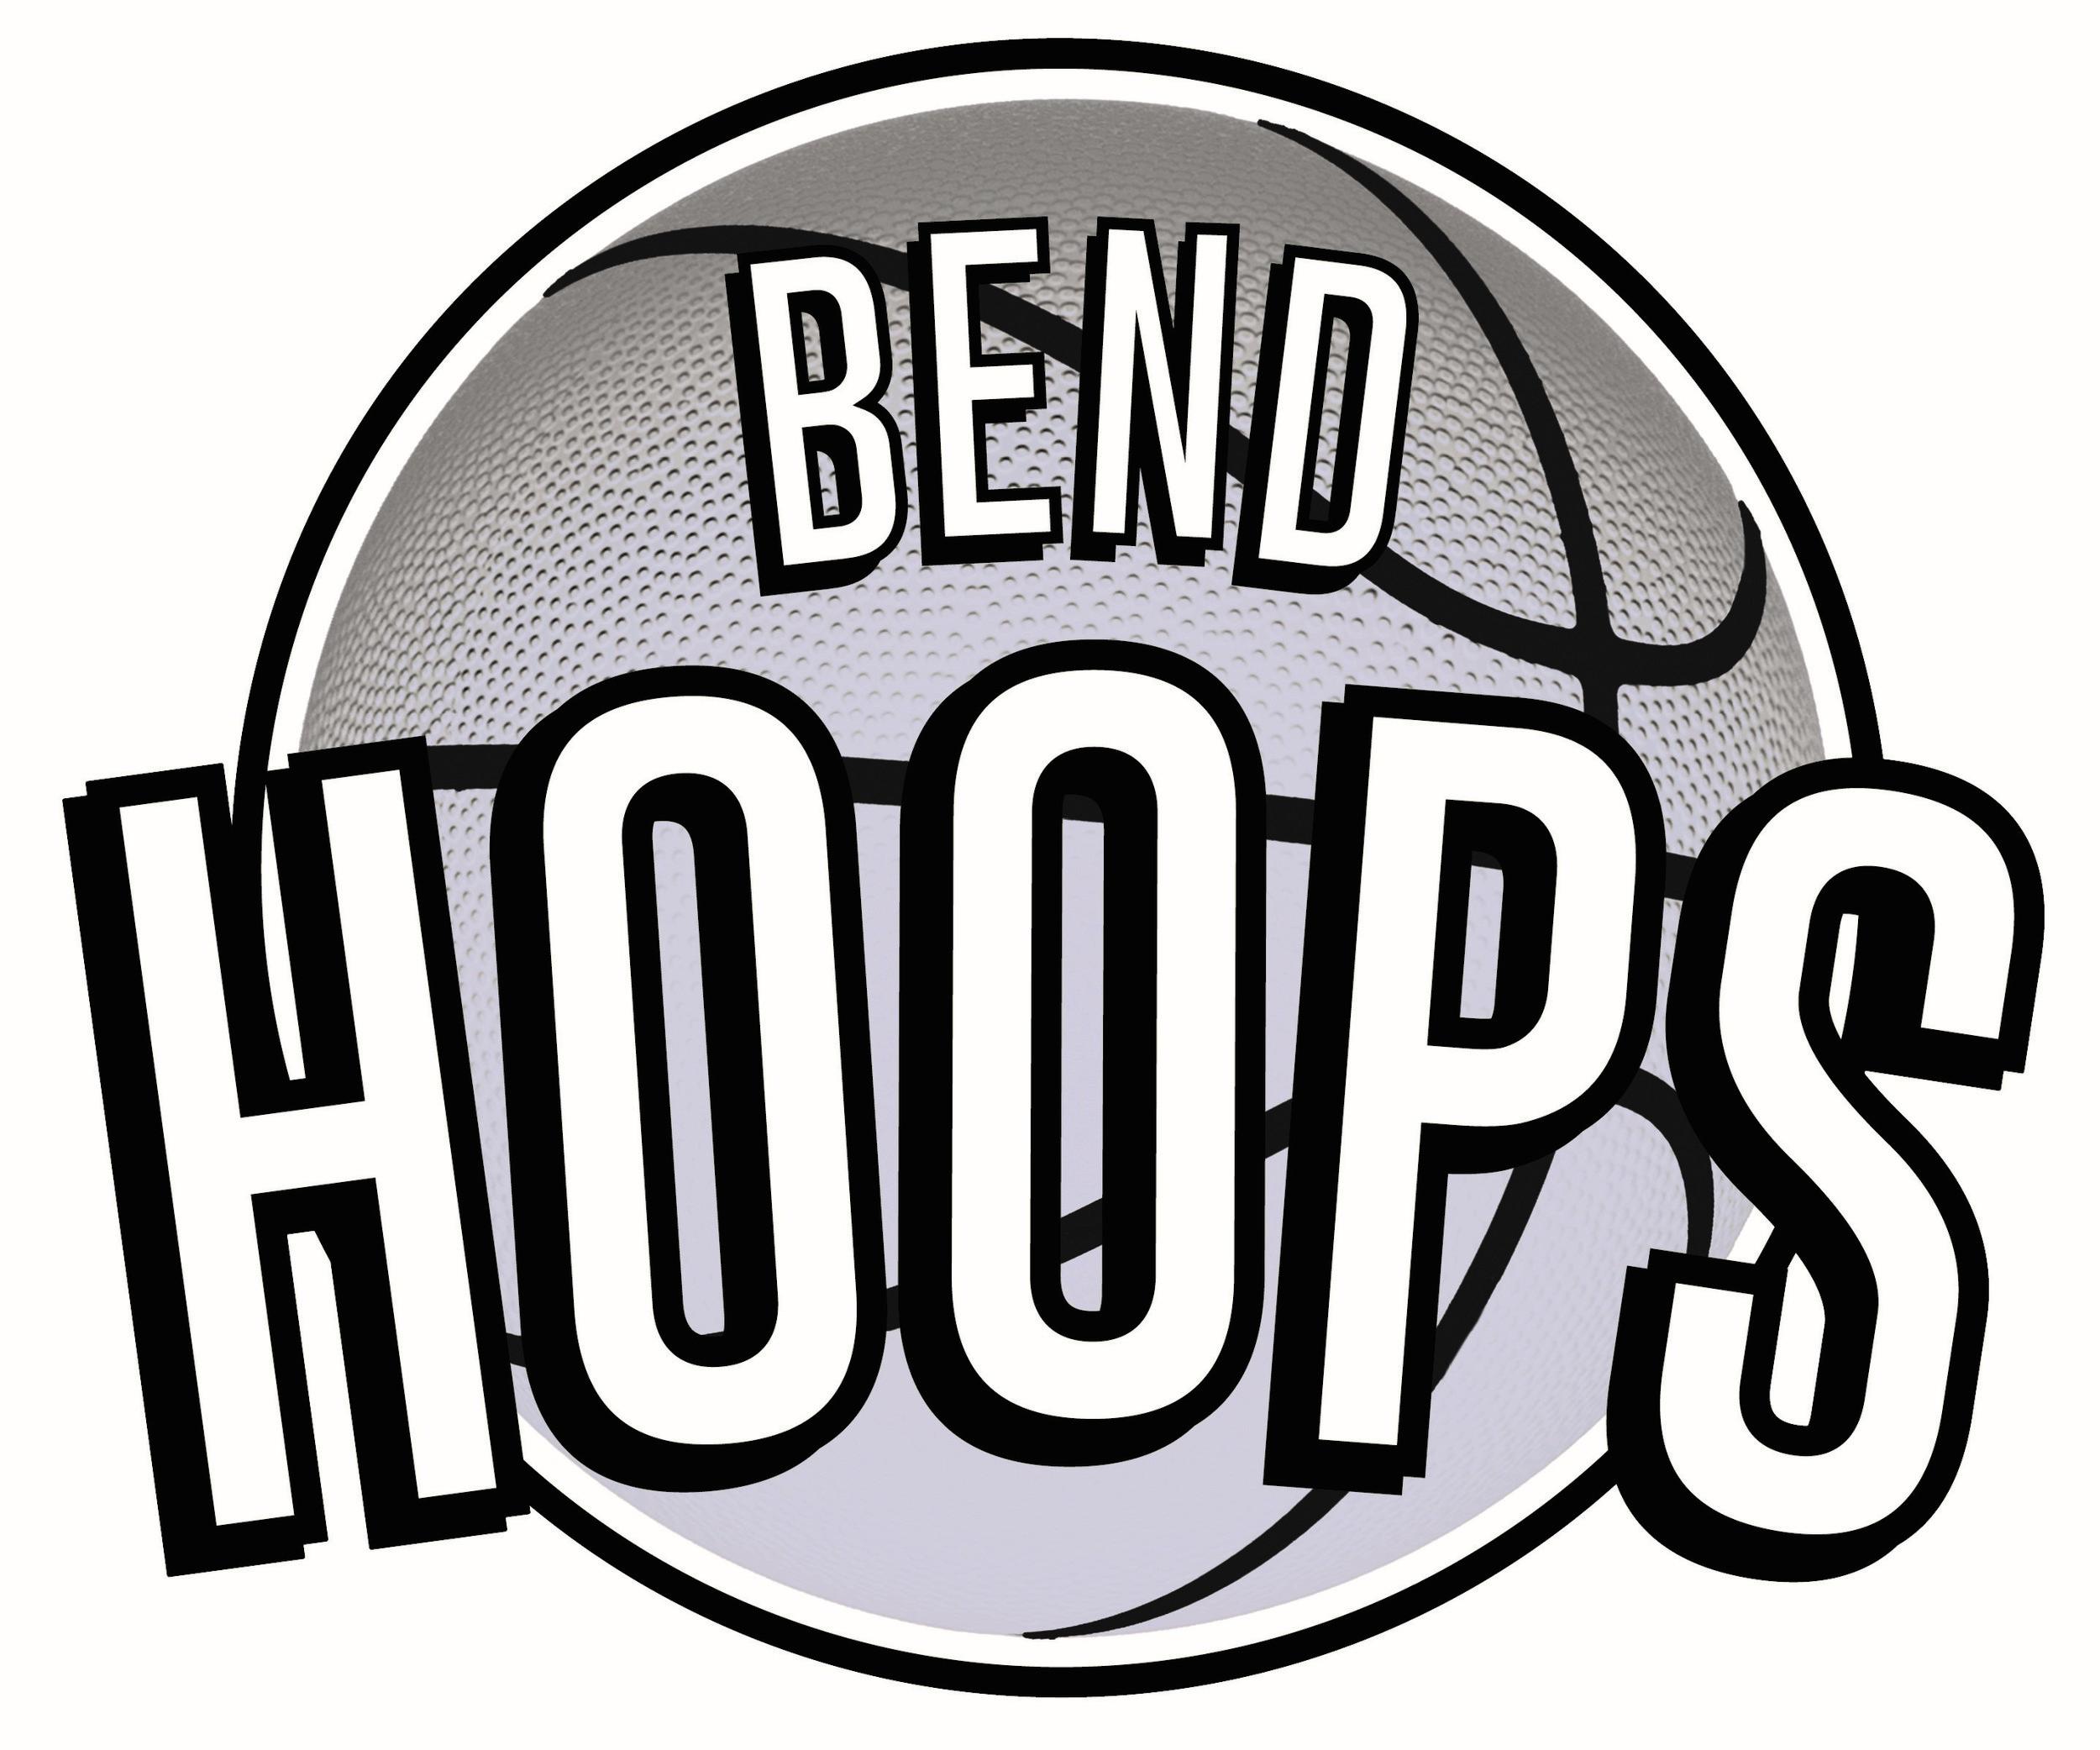 Bend Hoops Business